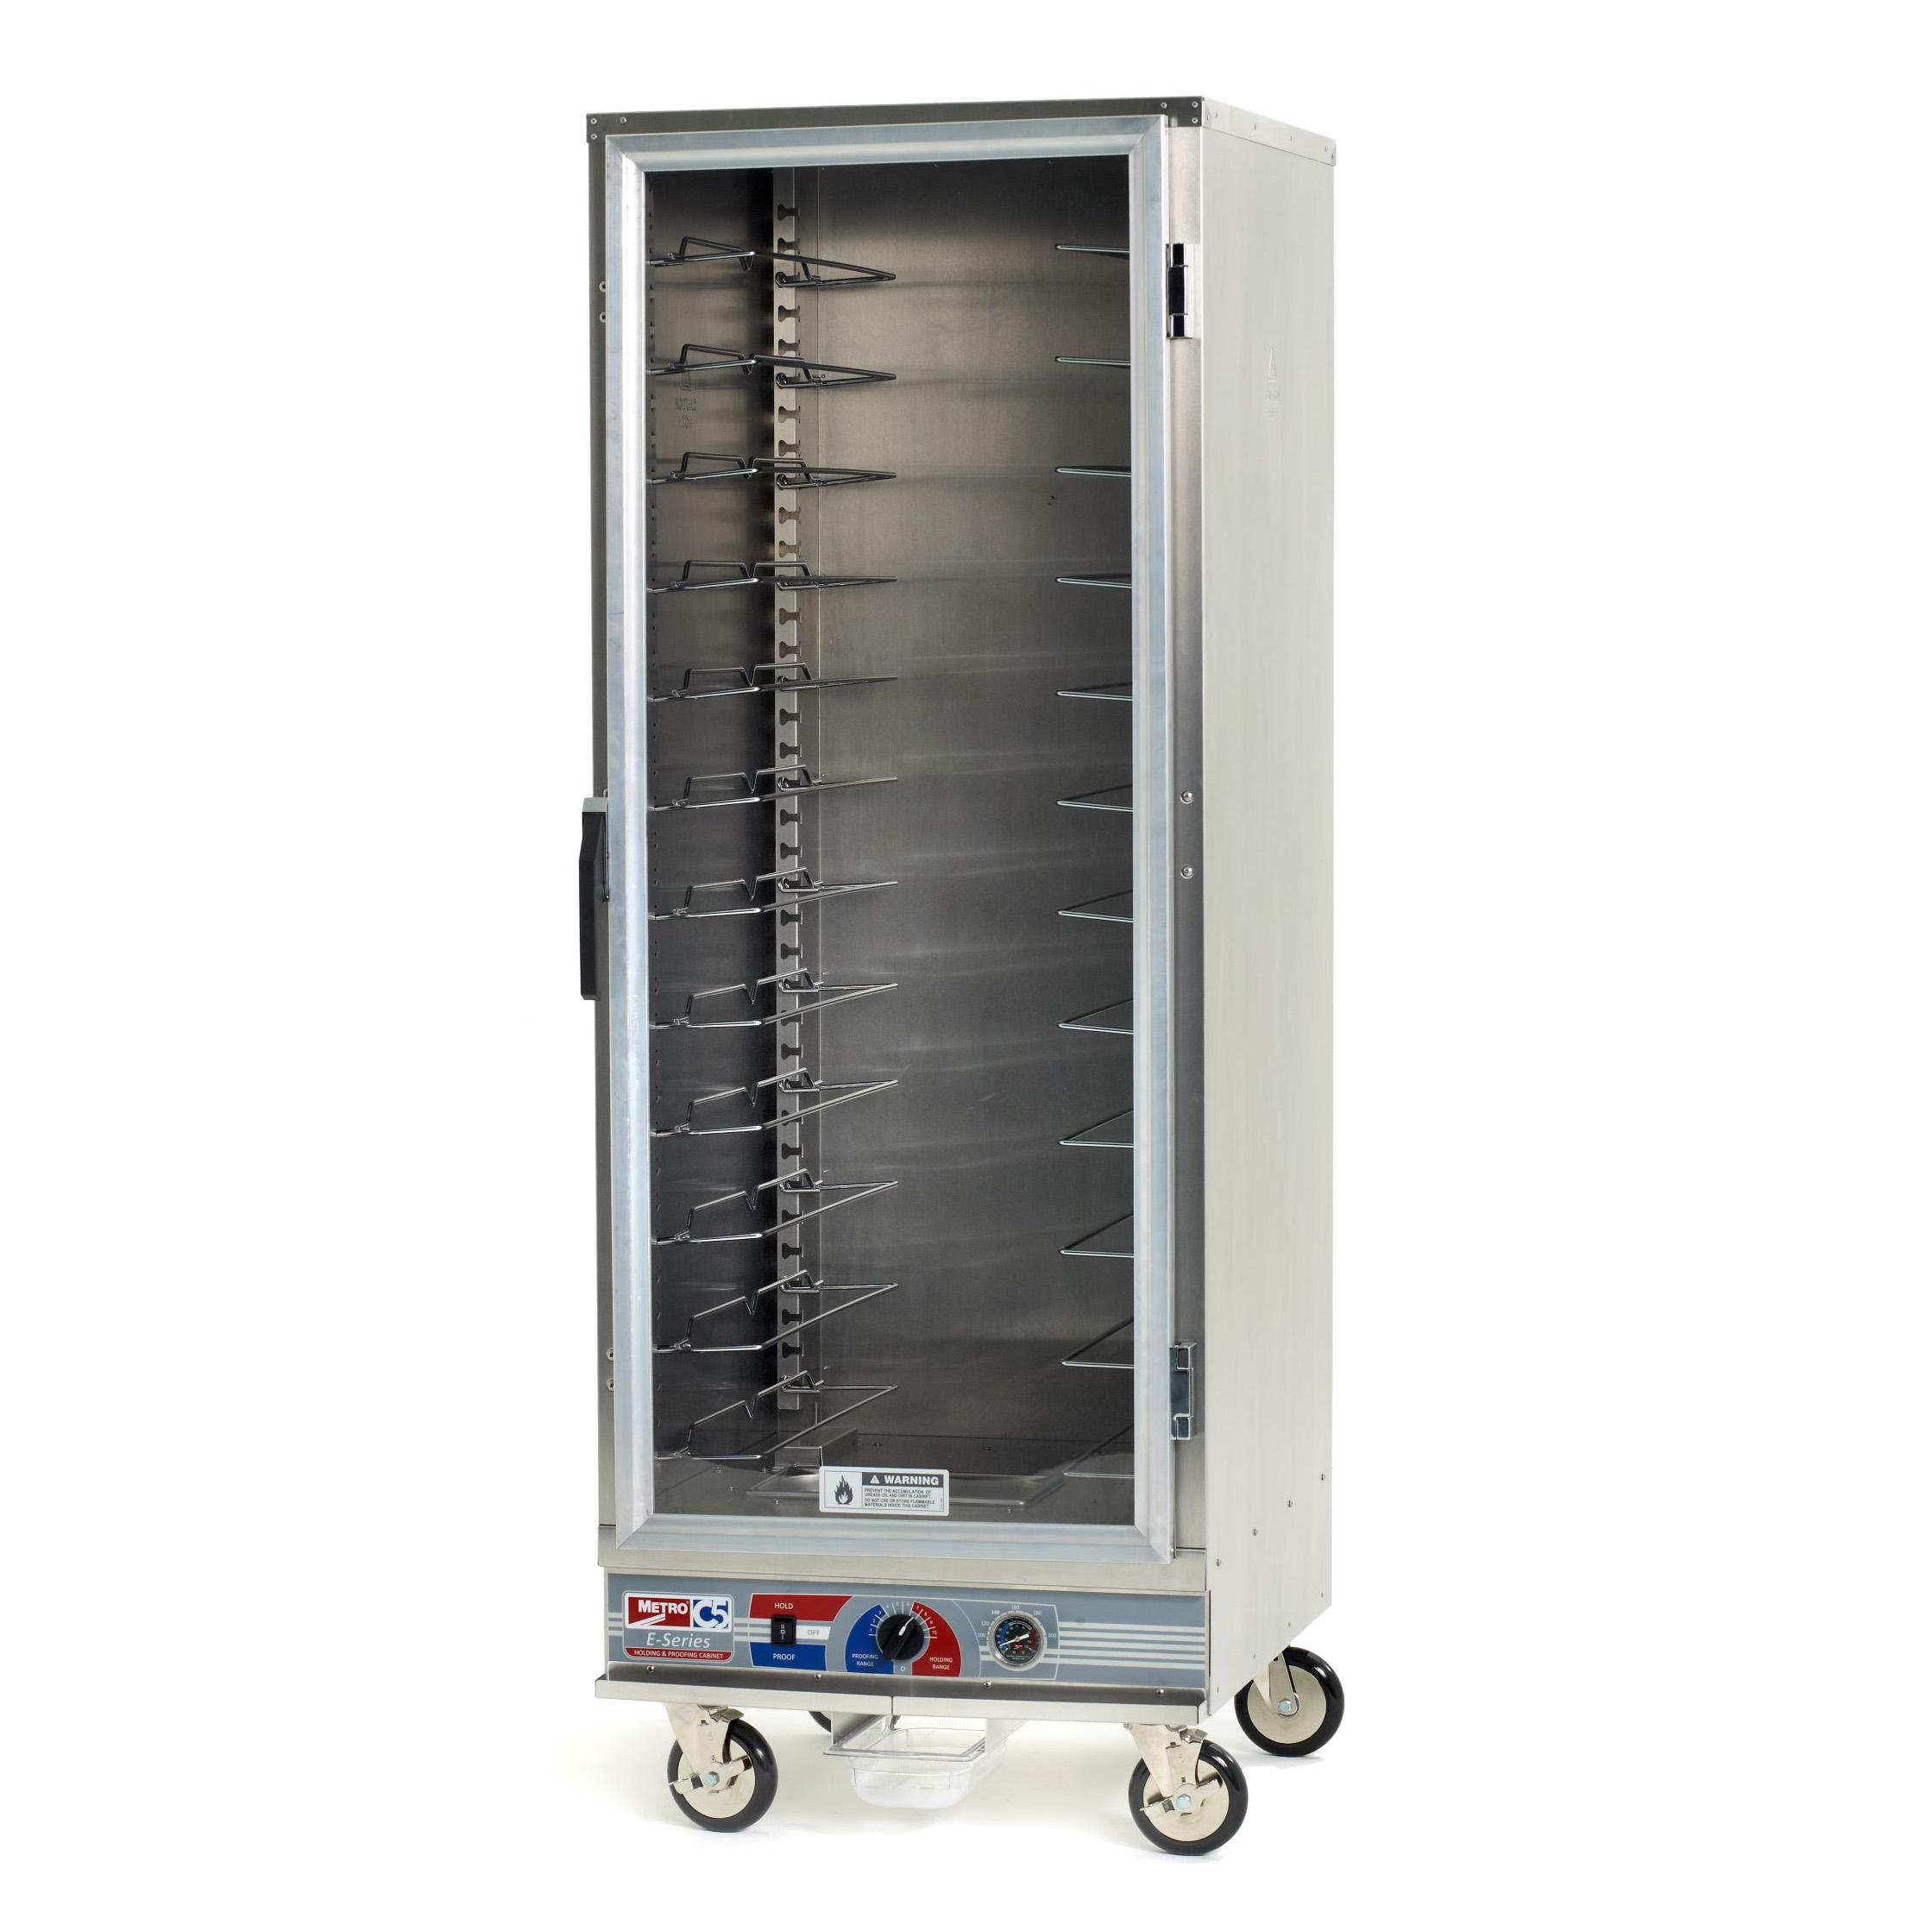 Metro C5E9-CFC-U proofer cabinet, mobile